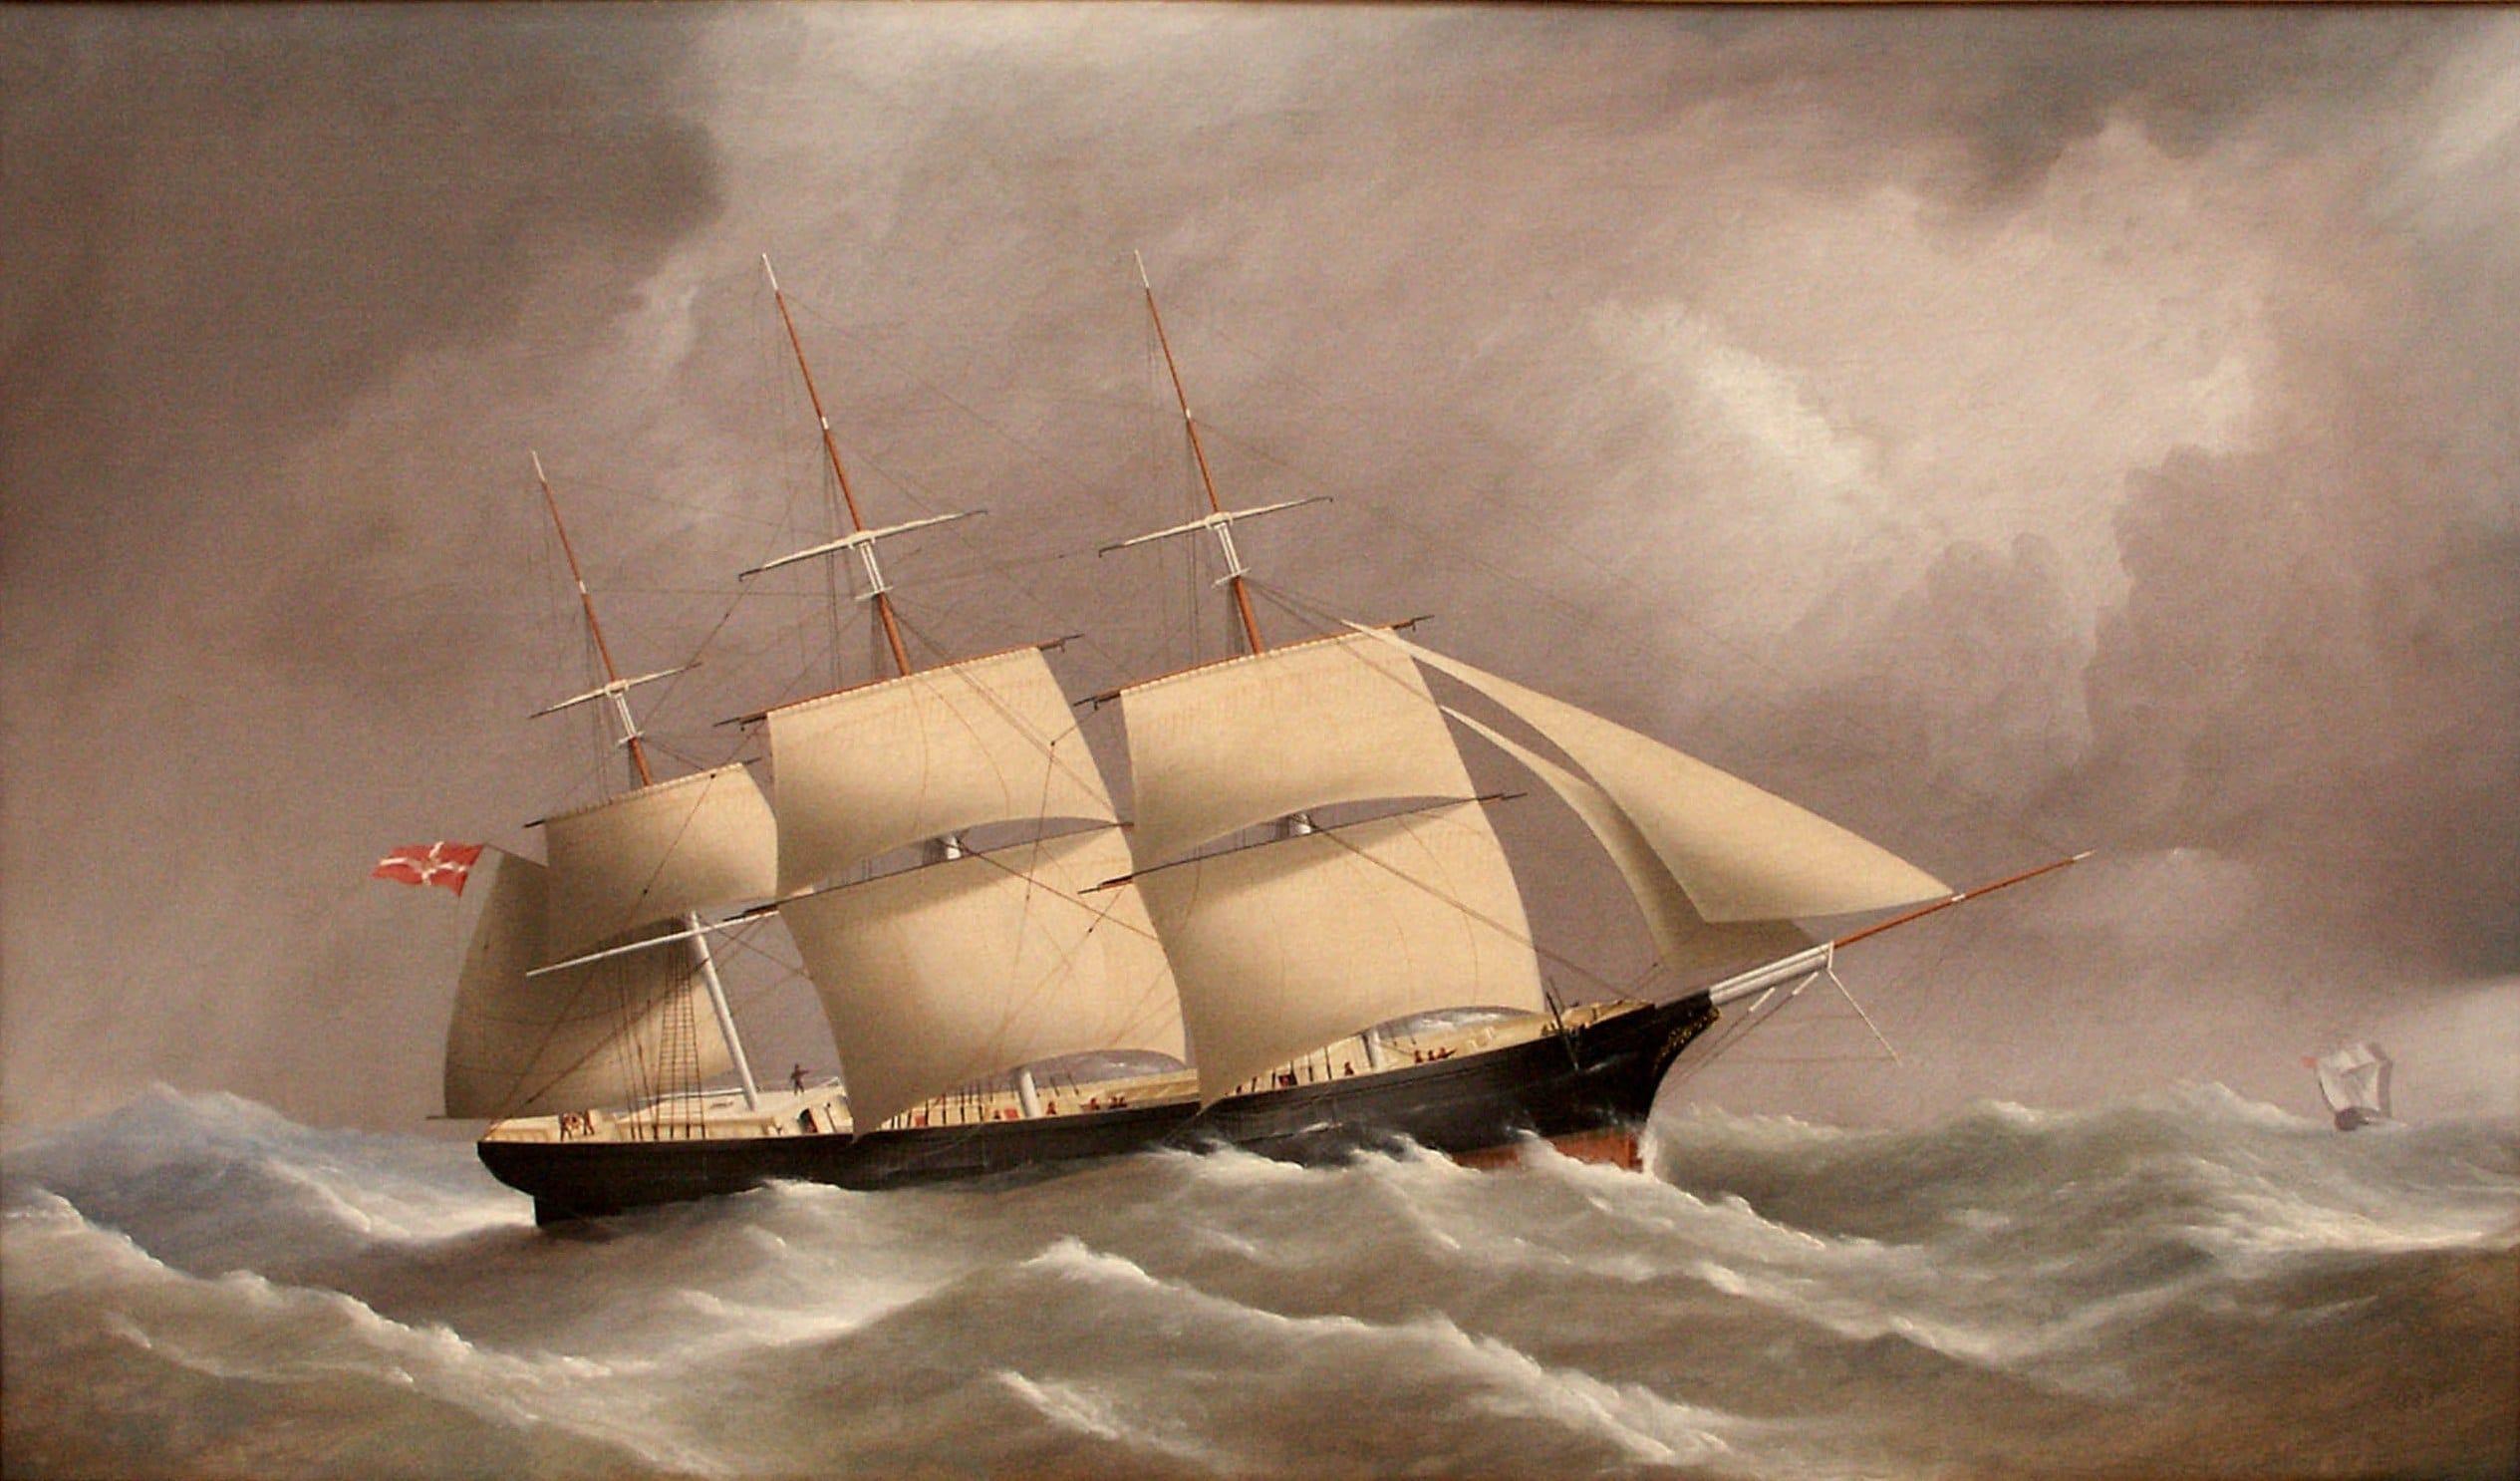 Oplev Aabenraas stolte søfartshistorie